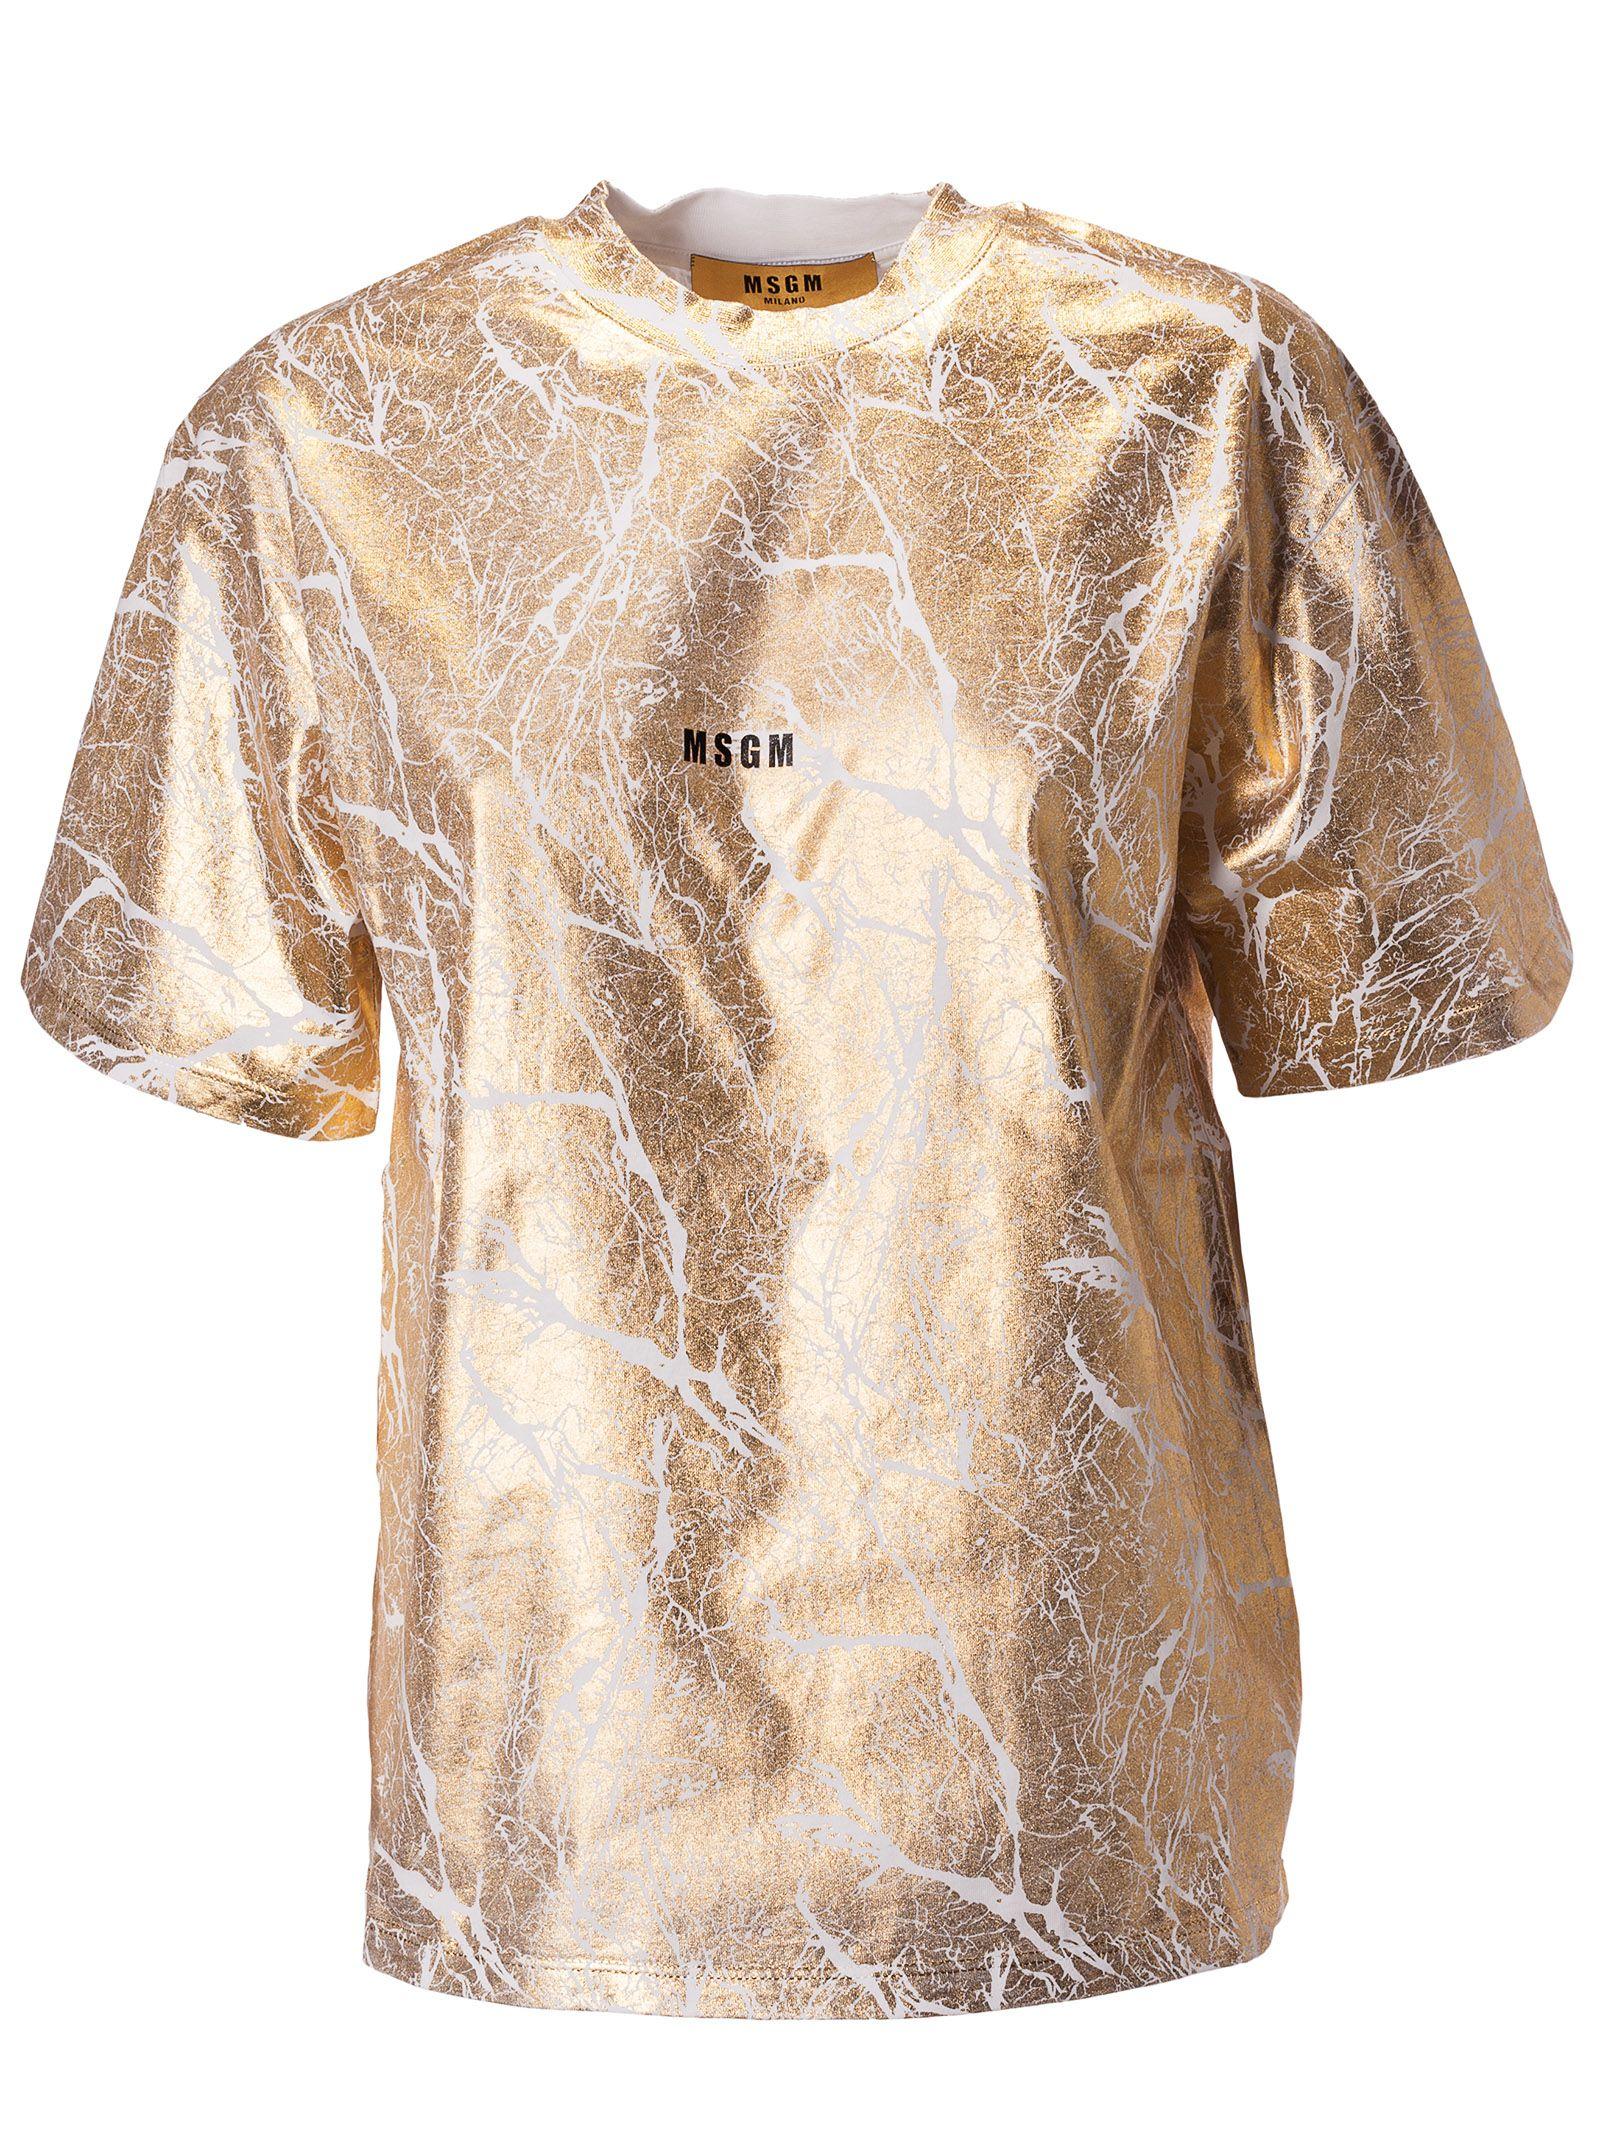 Msgm Msgm Logo Print T Shirt Whitegold 10797194 Italist